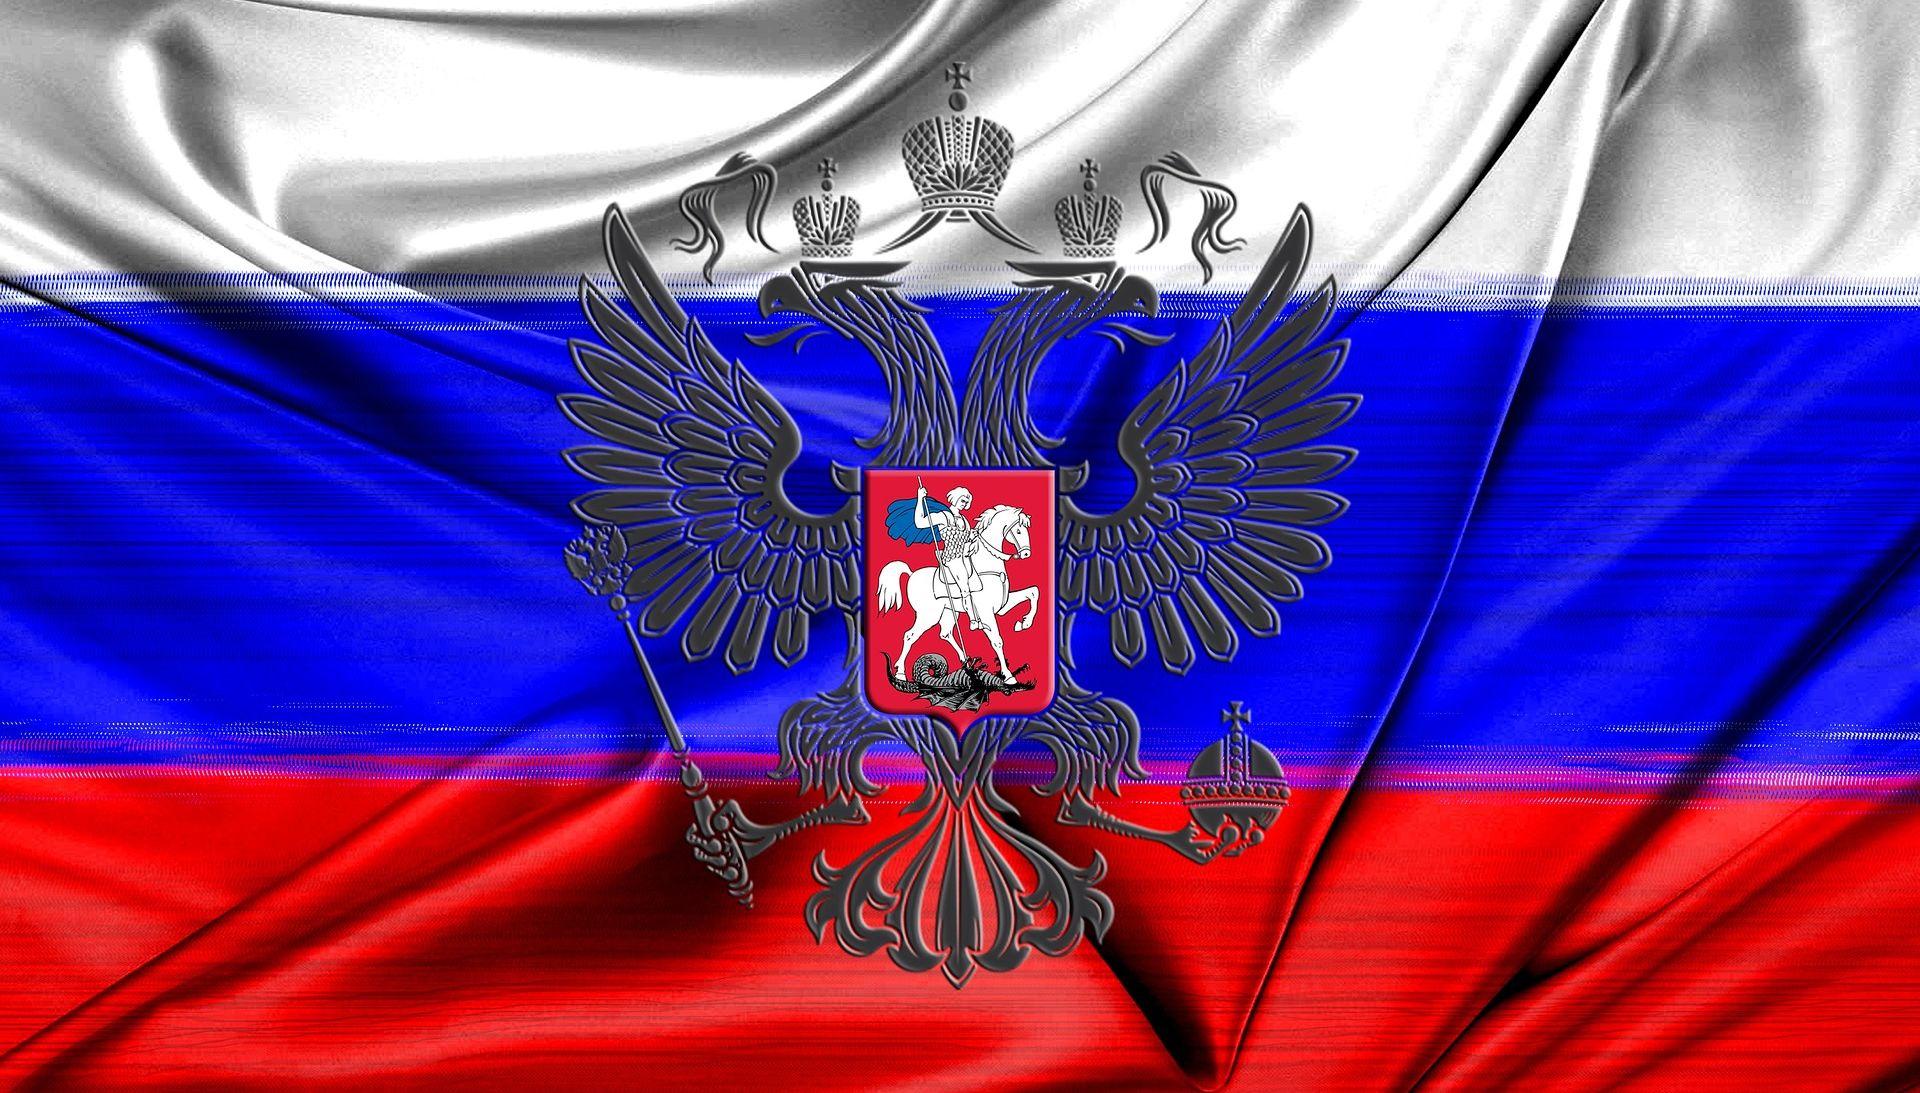 RUSKI MINISTAR NIKIFOROV 'Treba implementirati arbitražnu presudu, ali ne odustati od dijaloga'